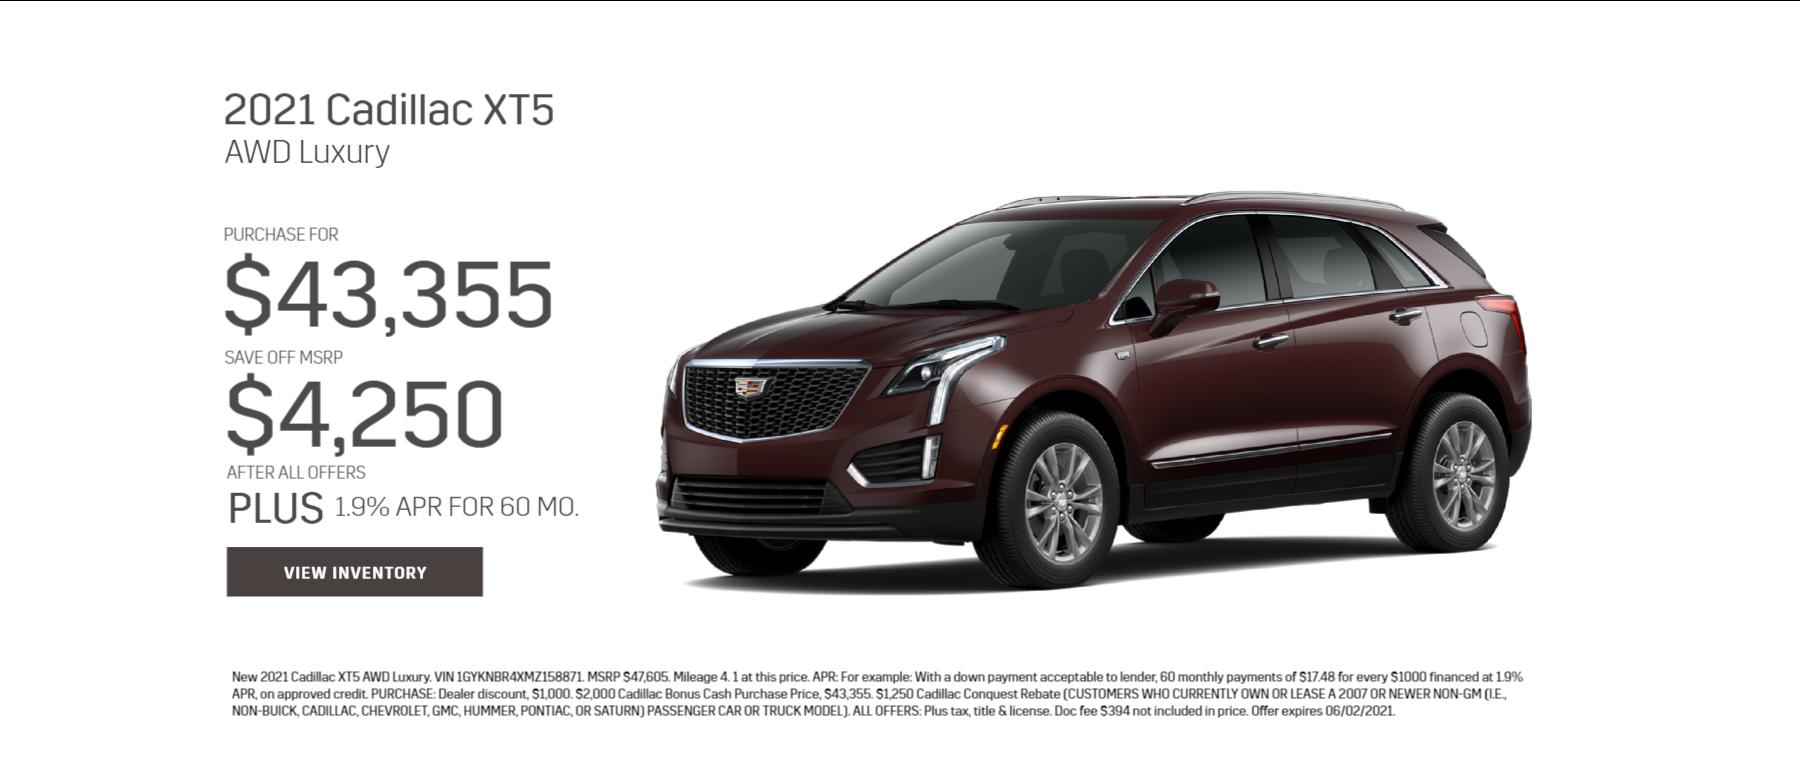 2021 Cadillac XT5 Purchase